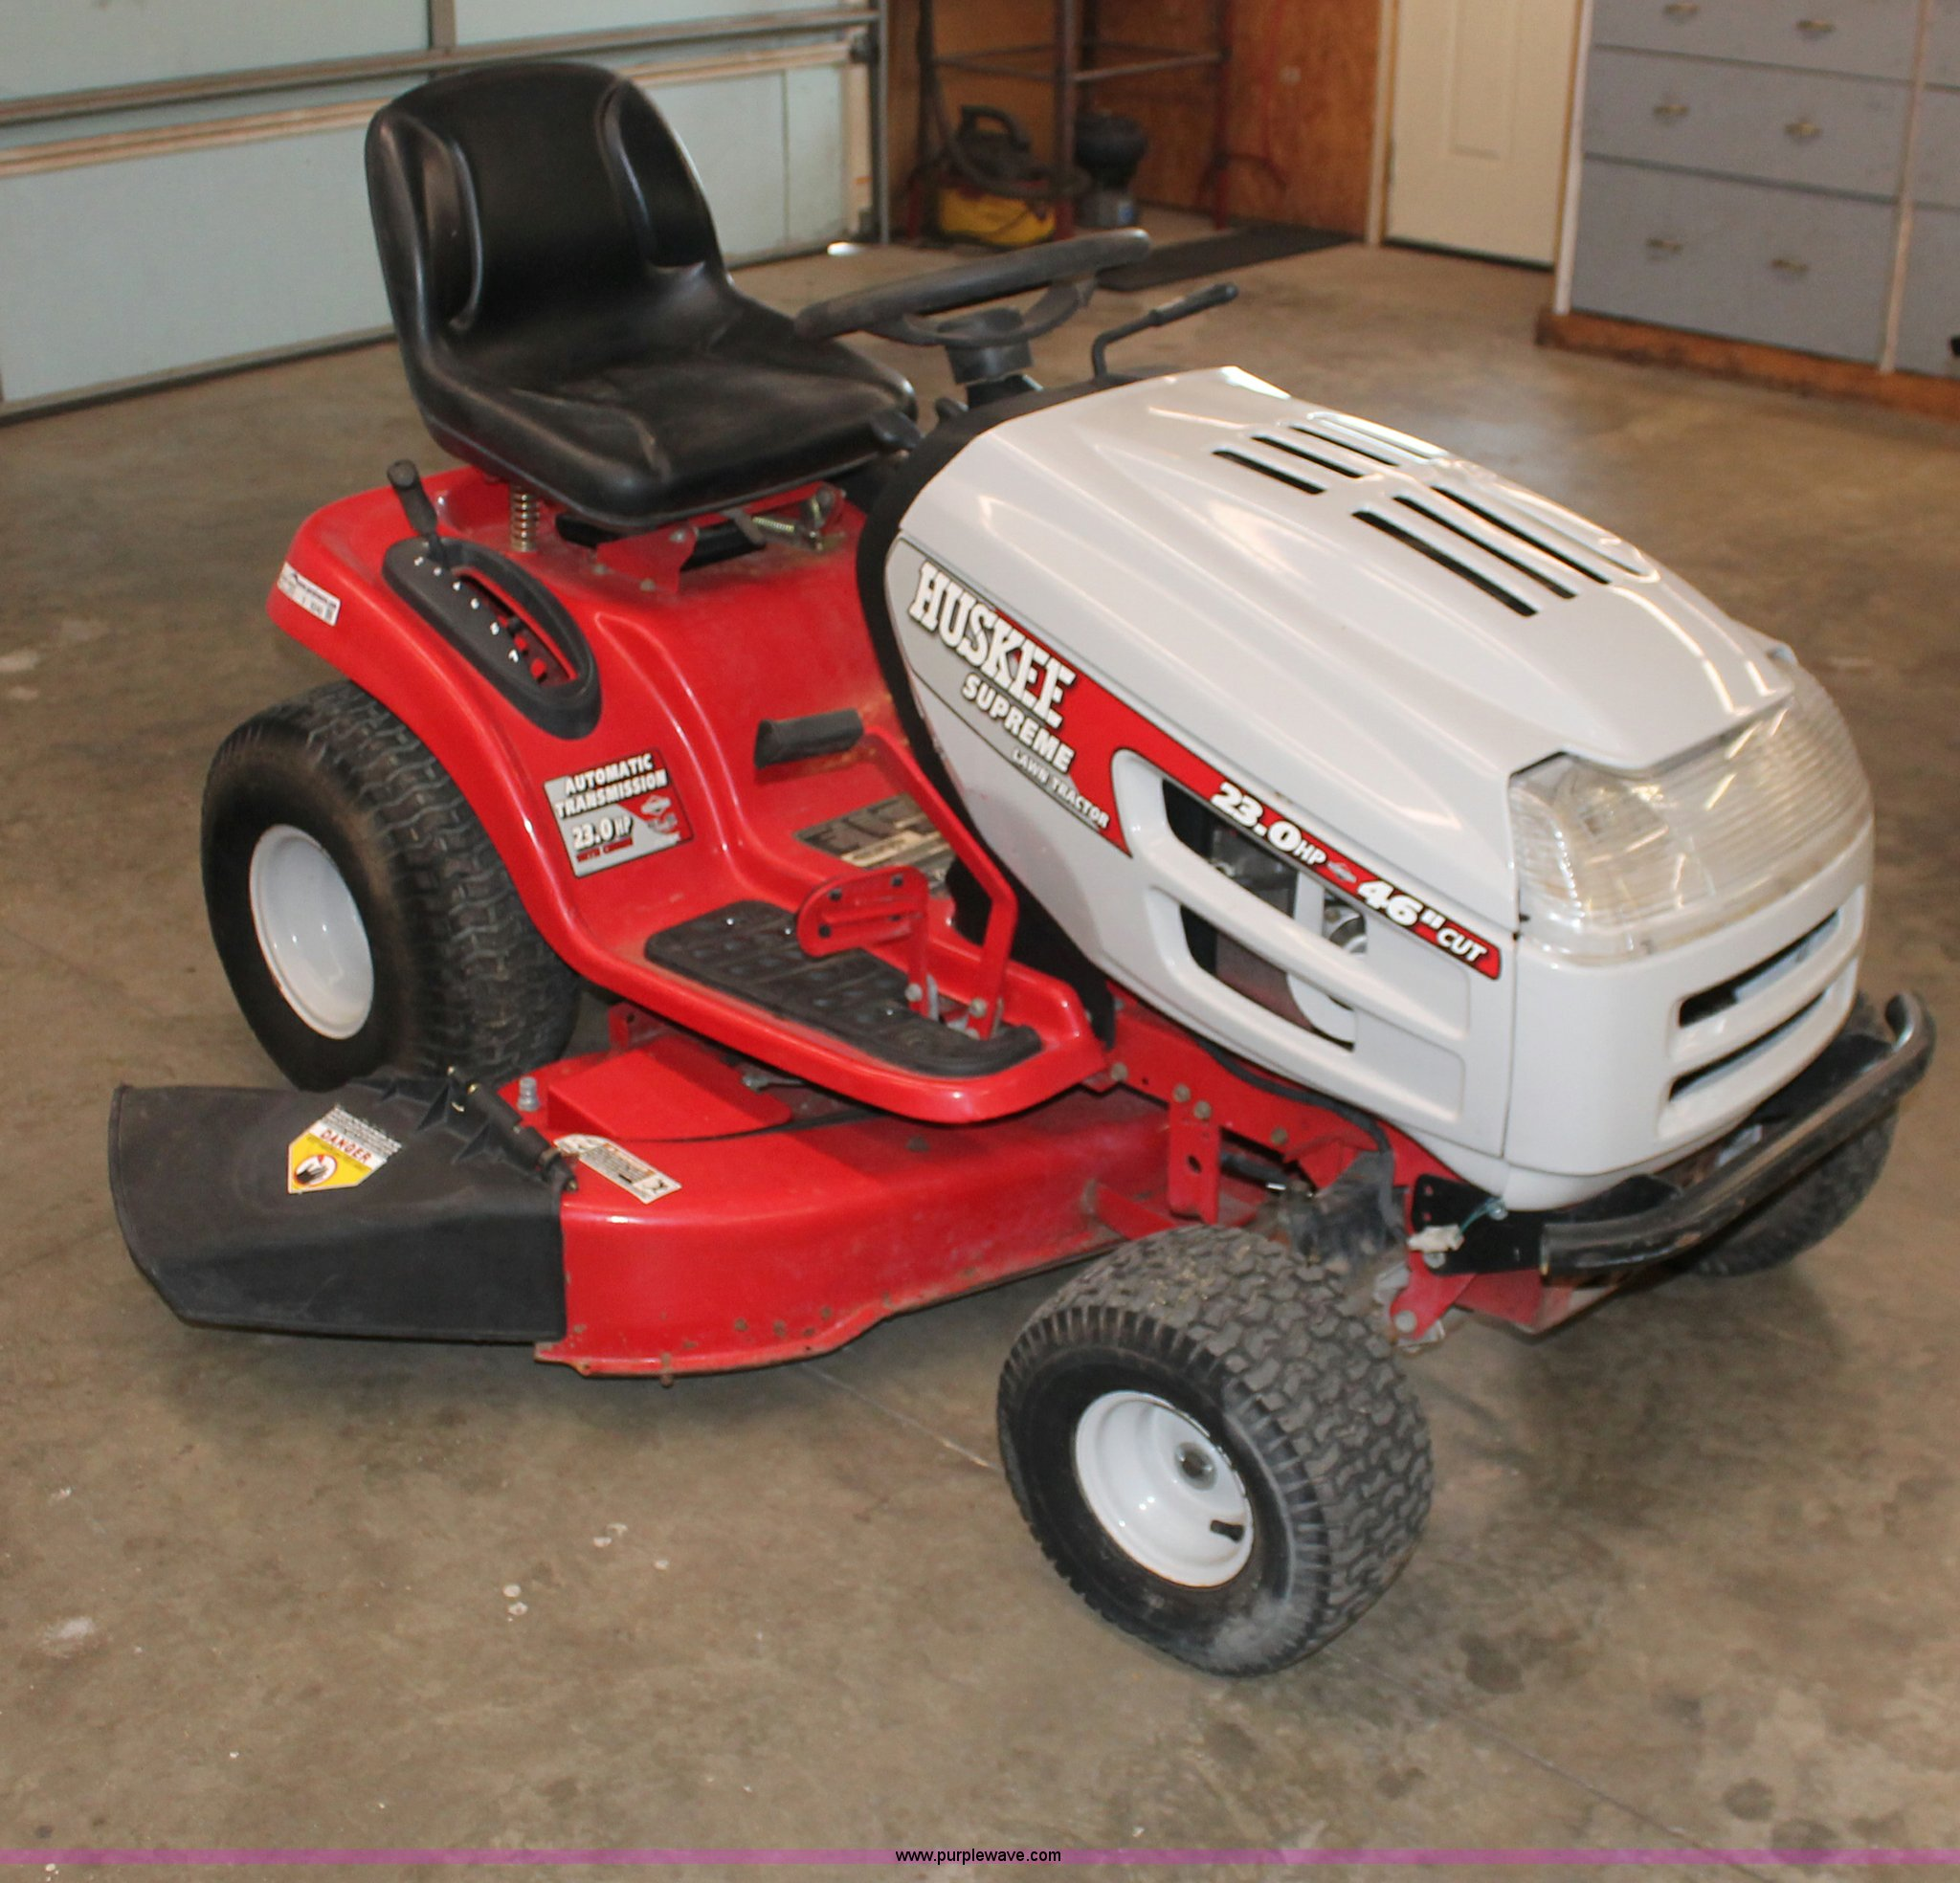 Huskee Supreme lawn mower   Item V9240   SOLD! February 20 M